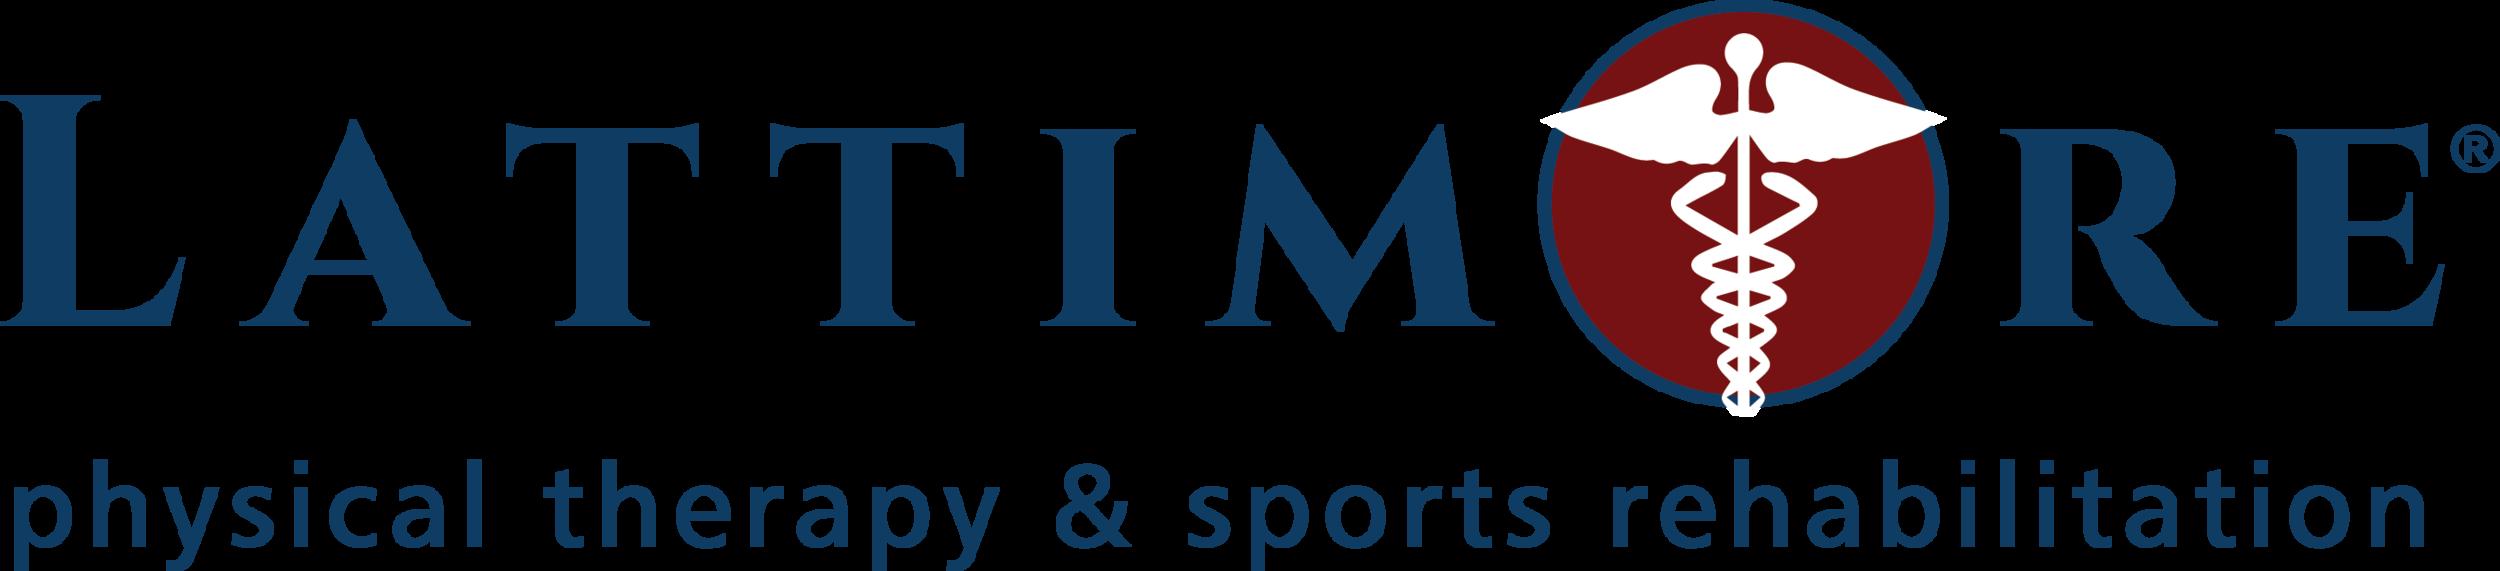 Lattimore Corporate Logo.png